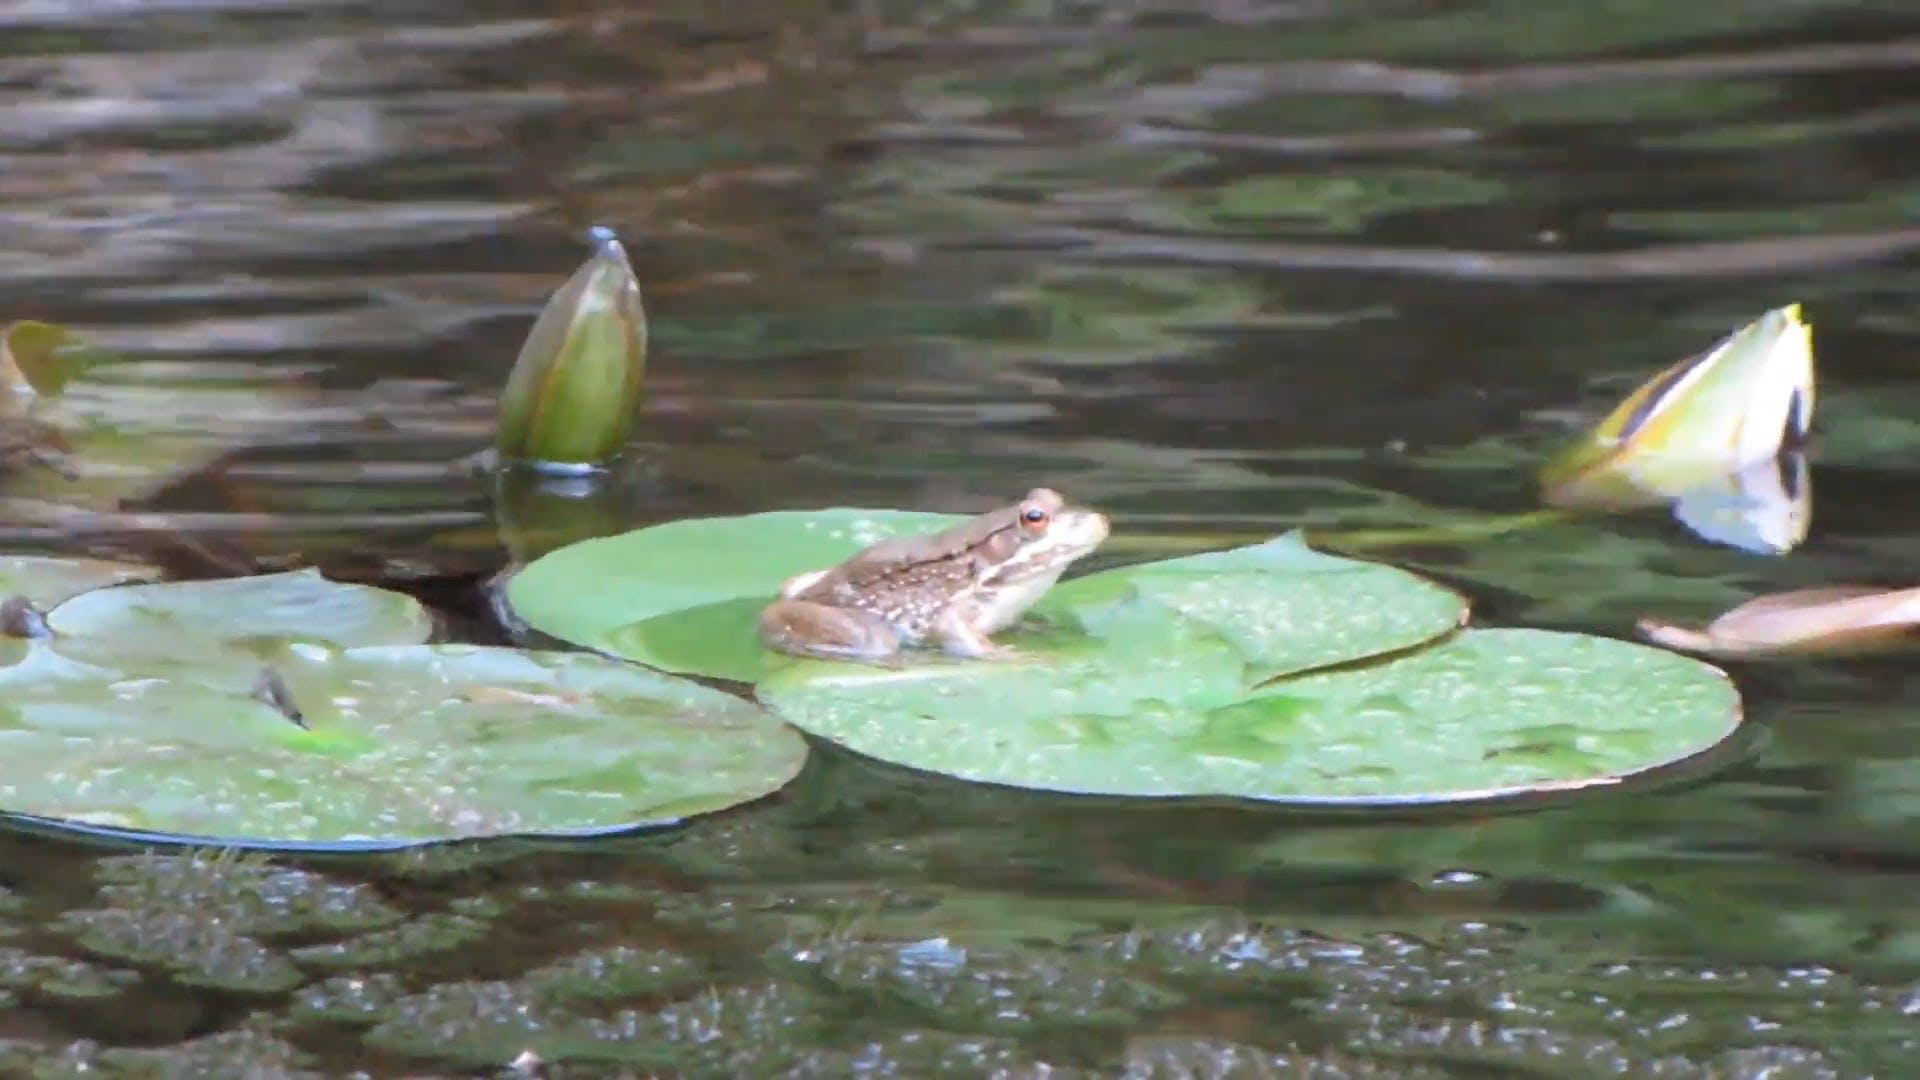 A Frog On A Leaf